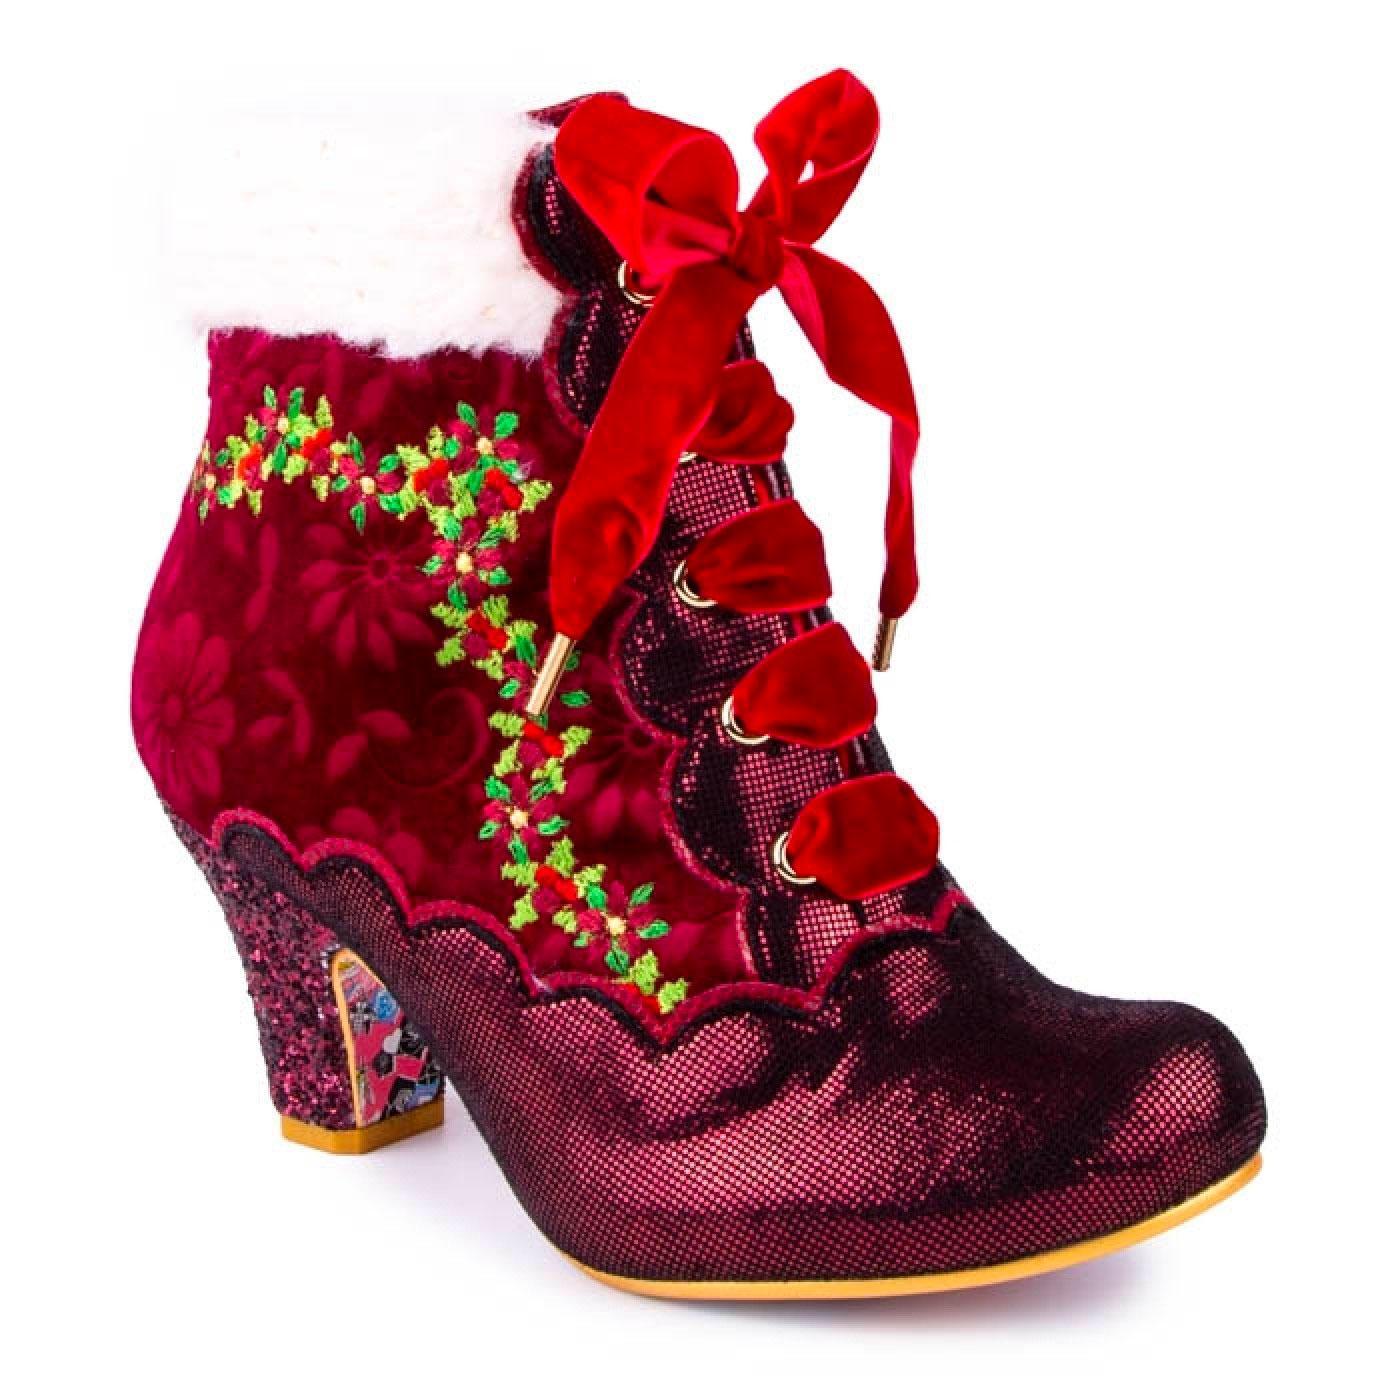 Hot Toddy IRREGULAR CHOICE Winter Festive Boots R